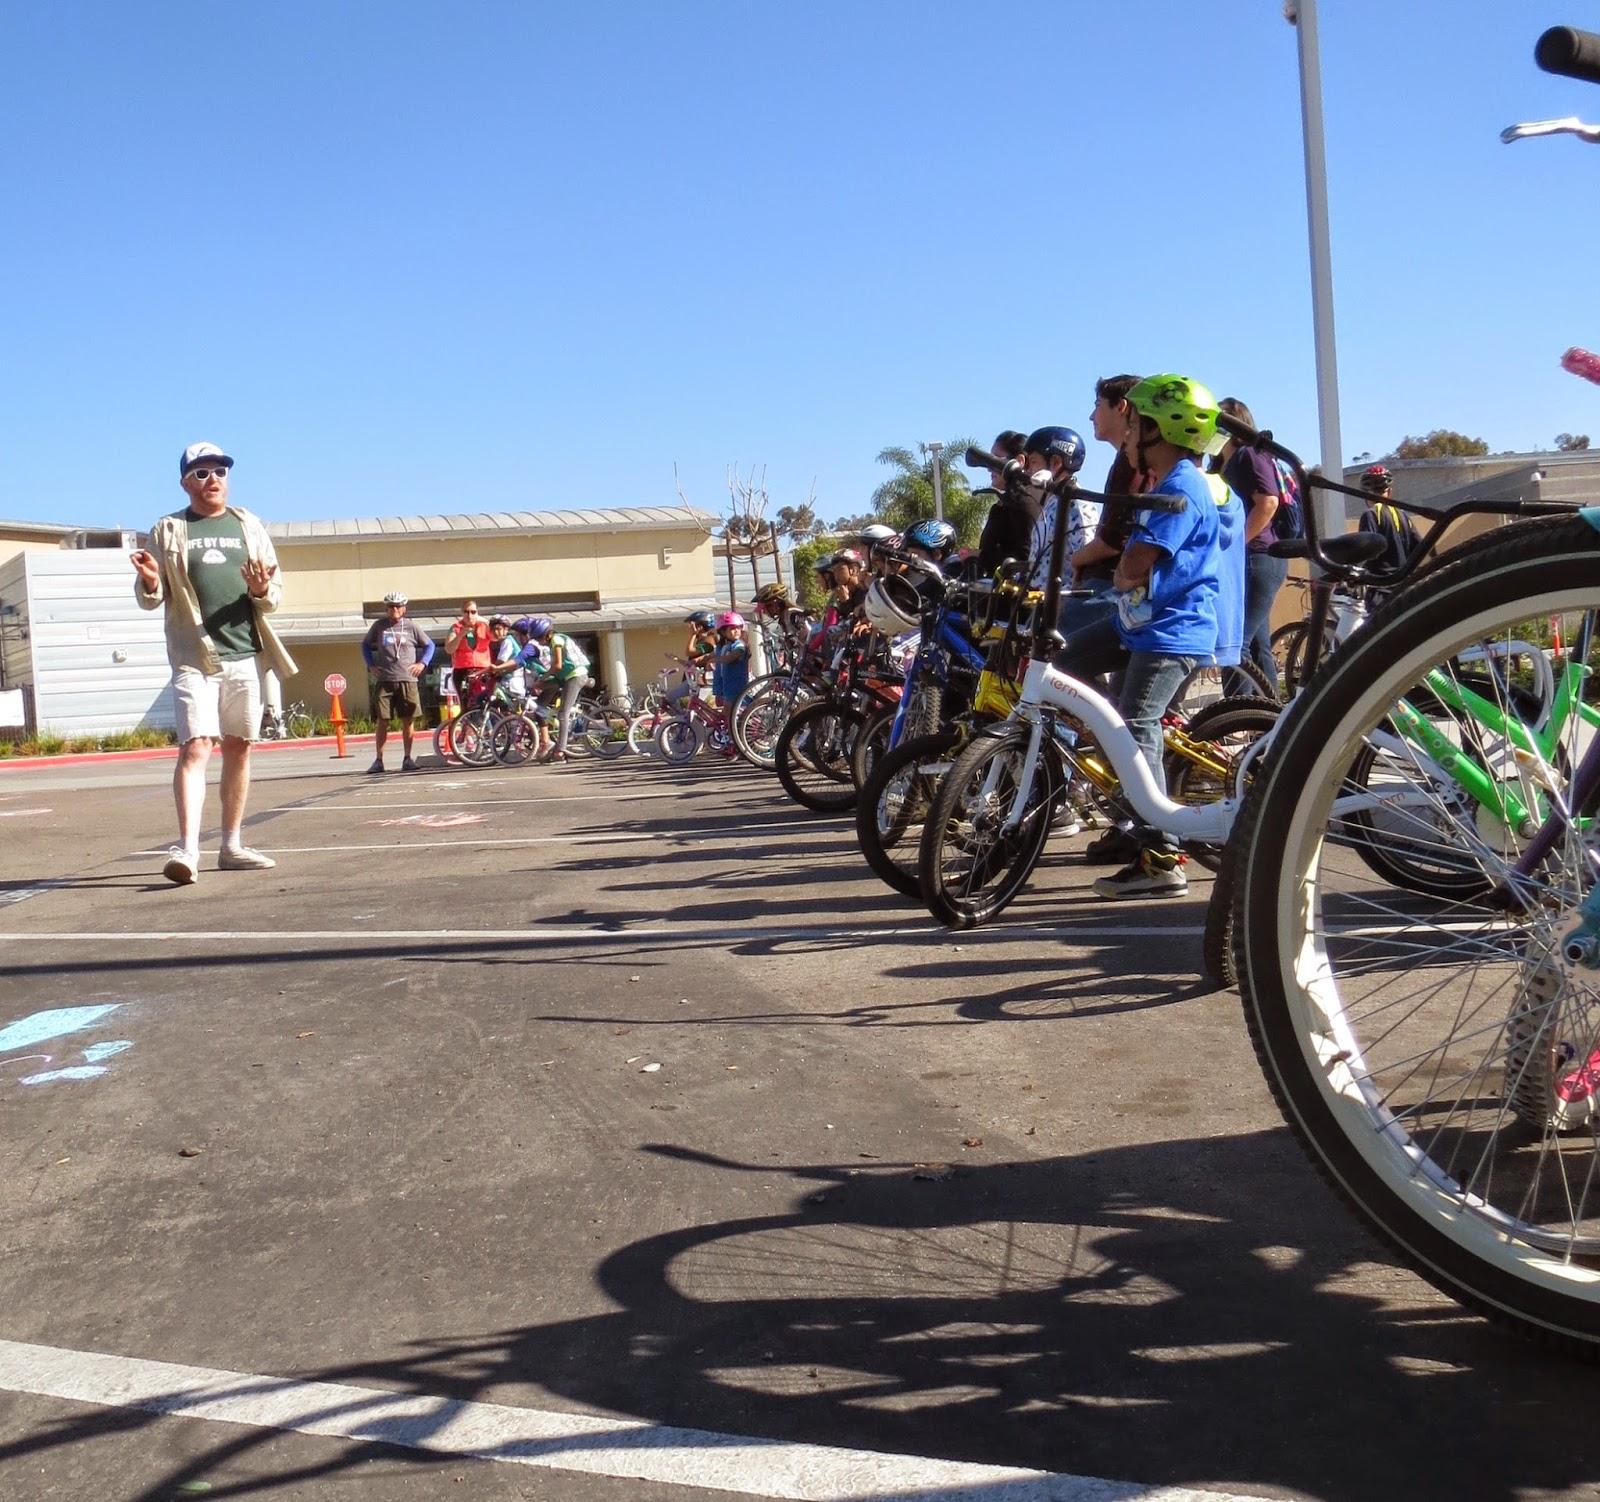 THE 10 BEST San Diego Bike Tours (with Photos) - TripAdvisor